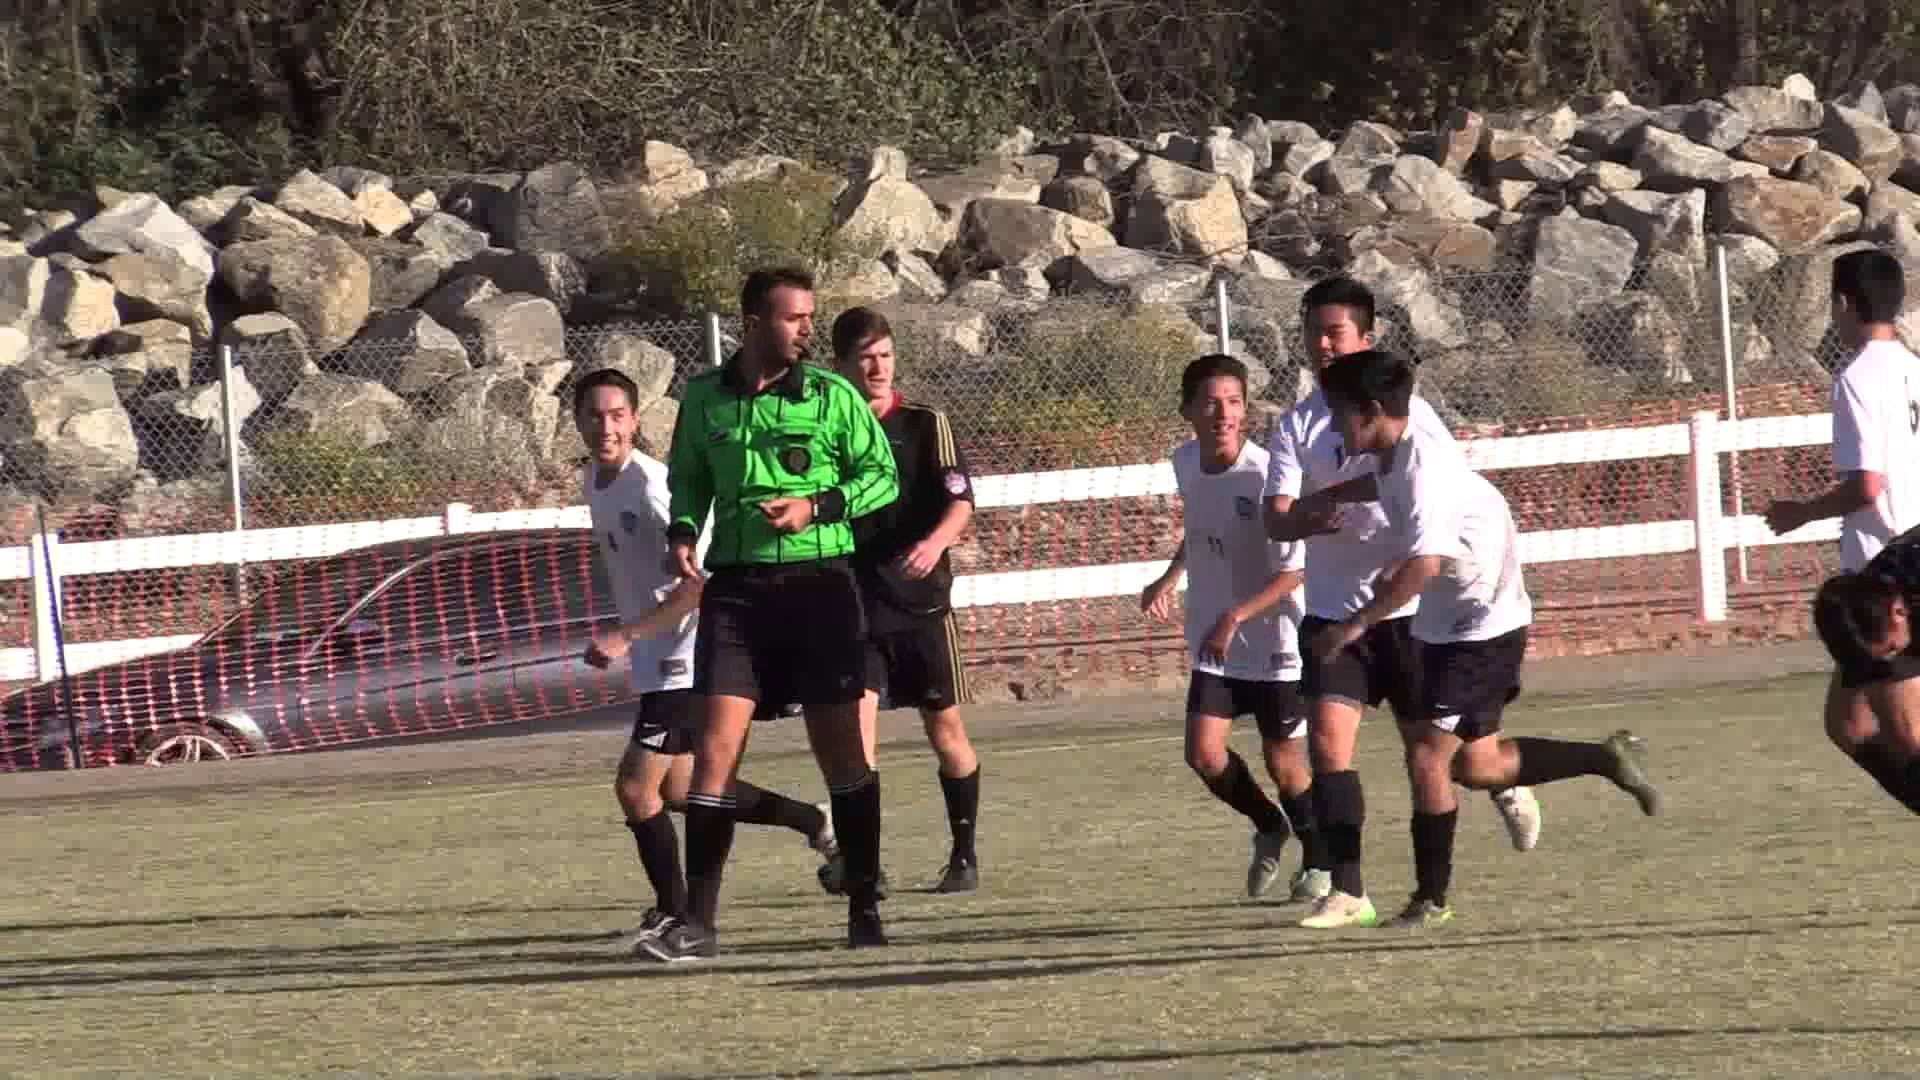 F. C. United vs Cypress  (Played on 11/14/15)